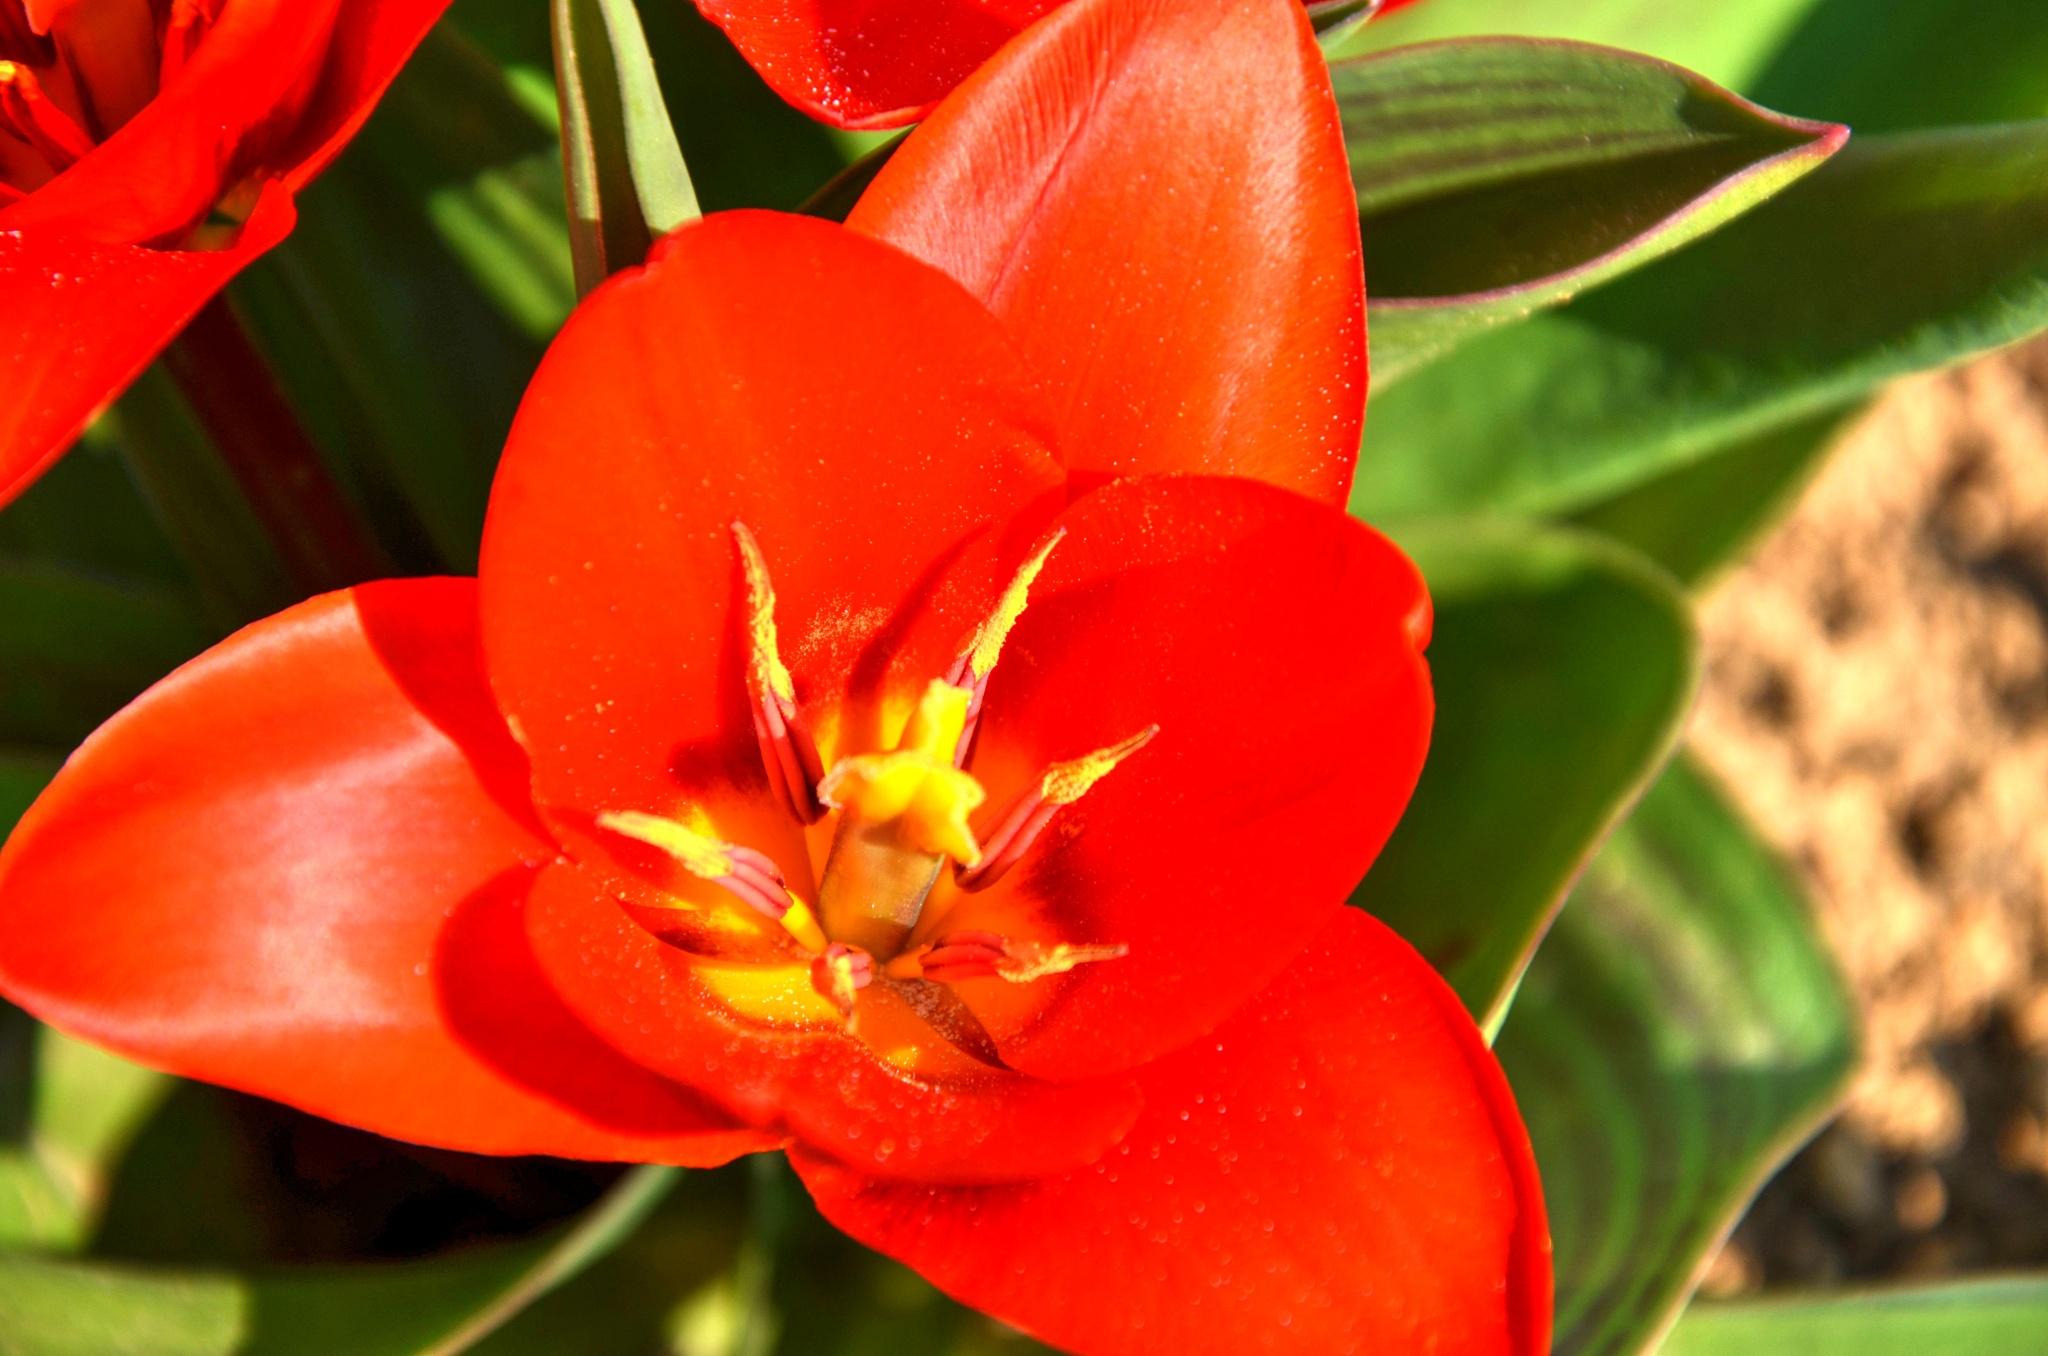 Tulip by Dejan Novak